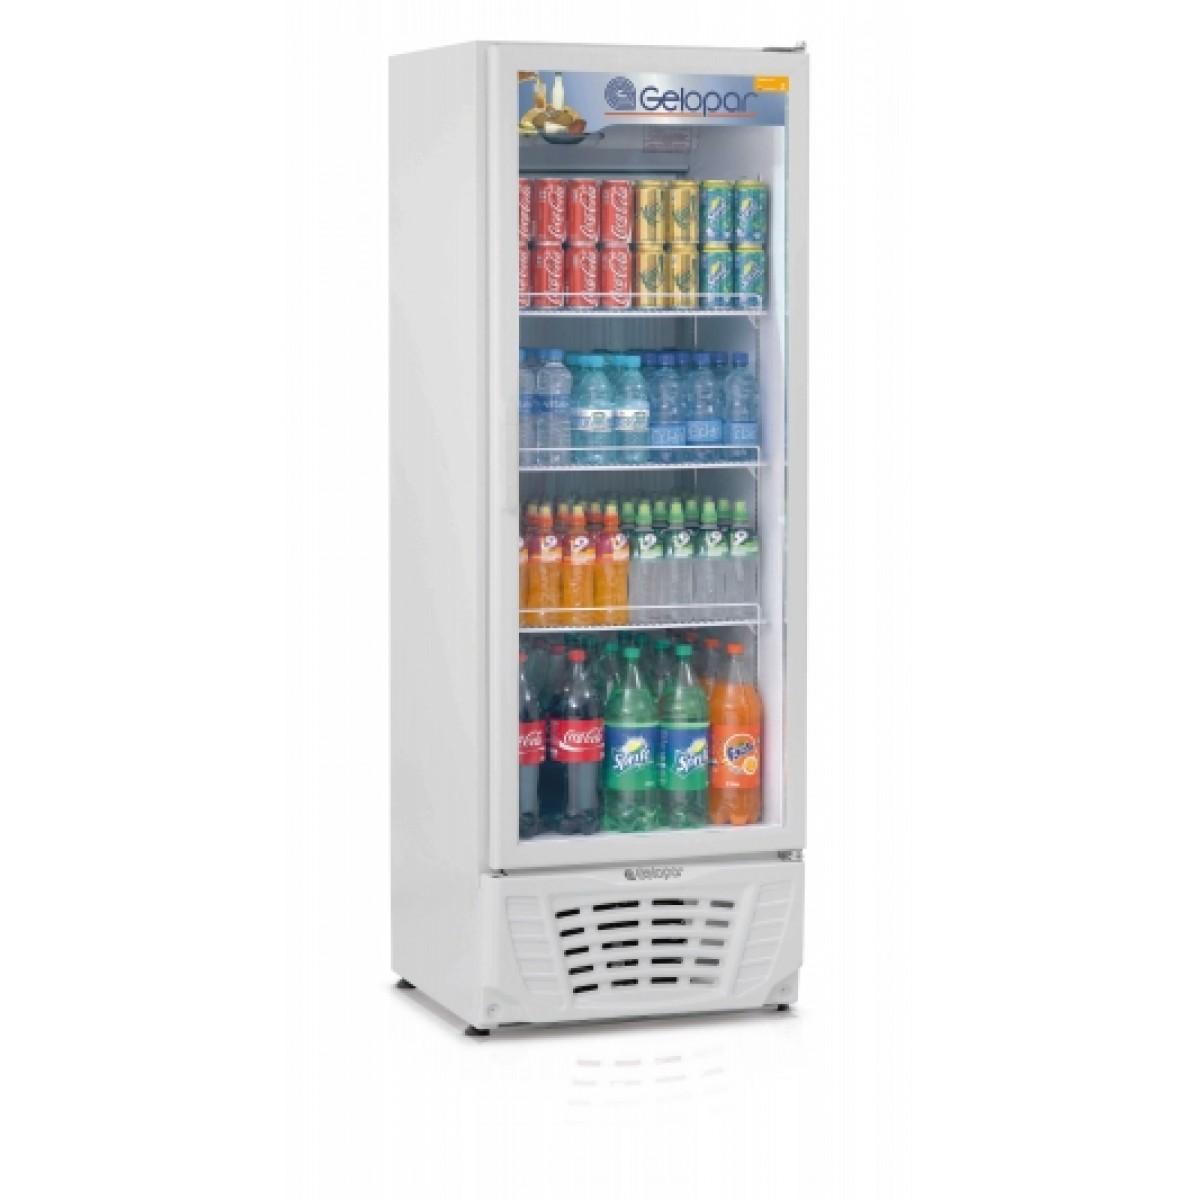 Refrigerador vertical GPTU-40 Gelopar